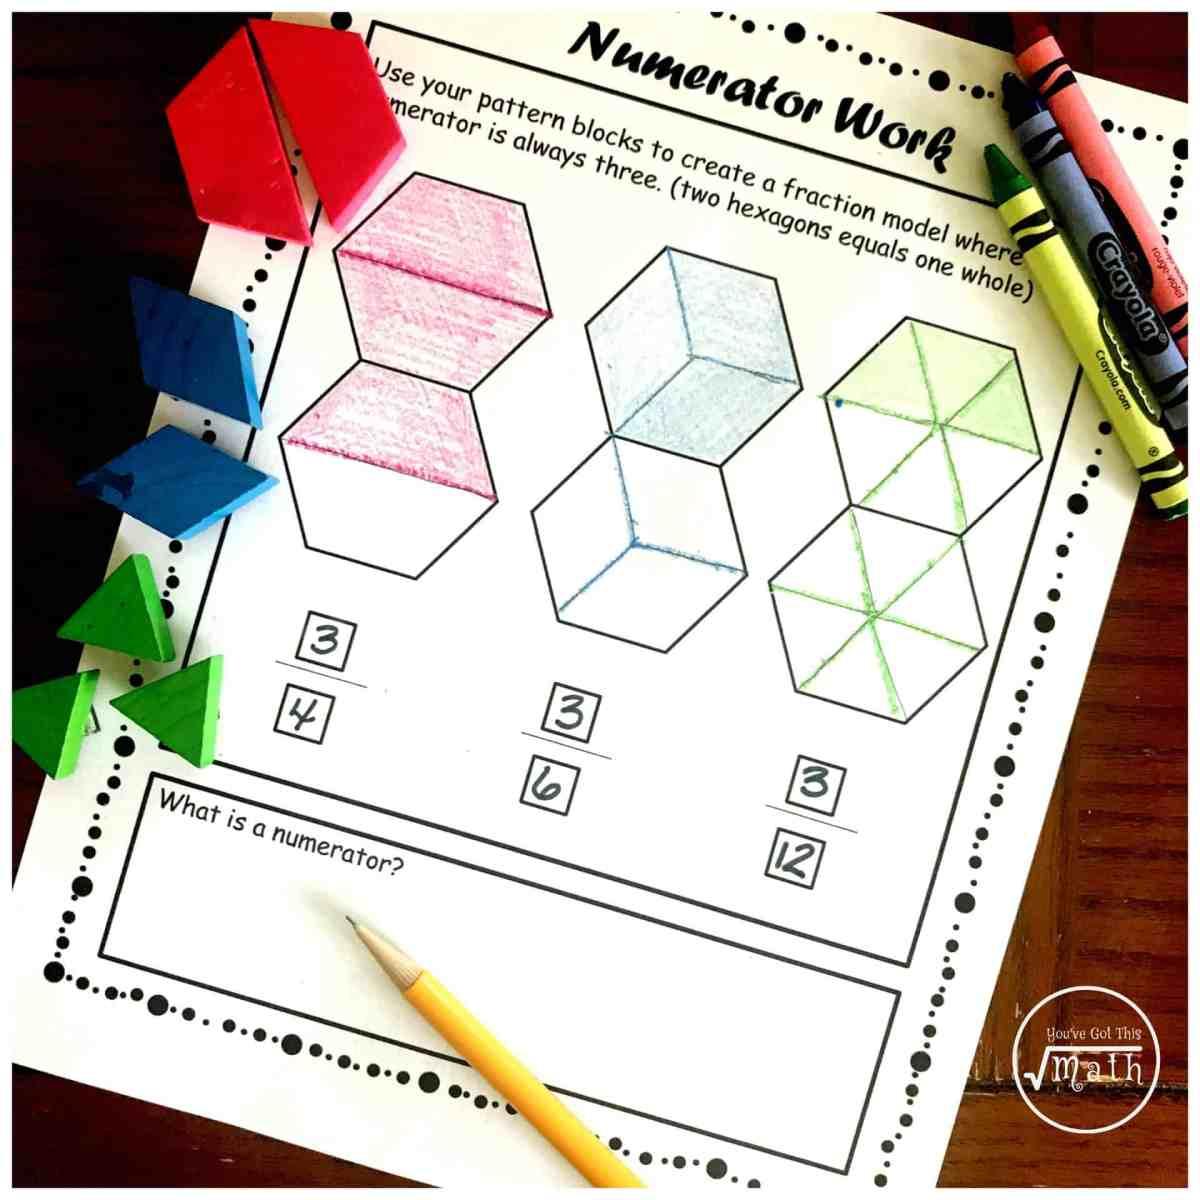 Three Steps For Teaching Numerators and Denominators